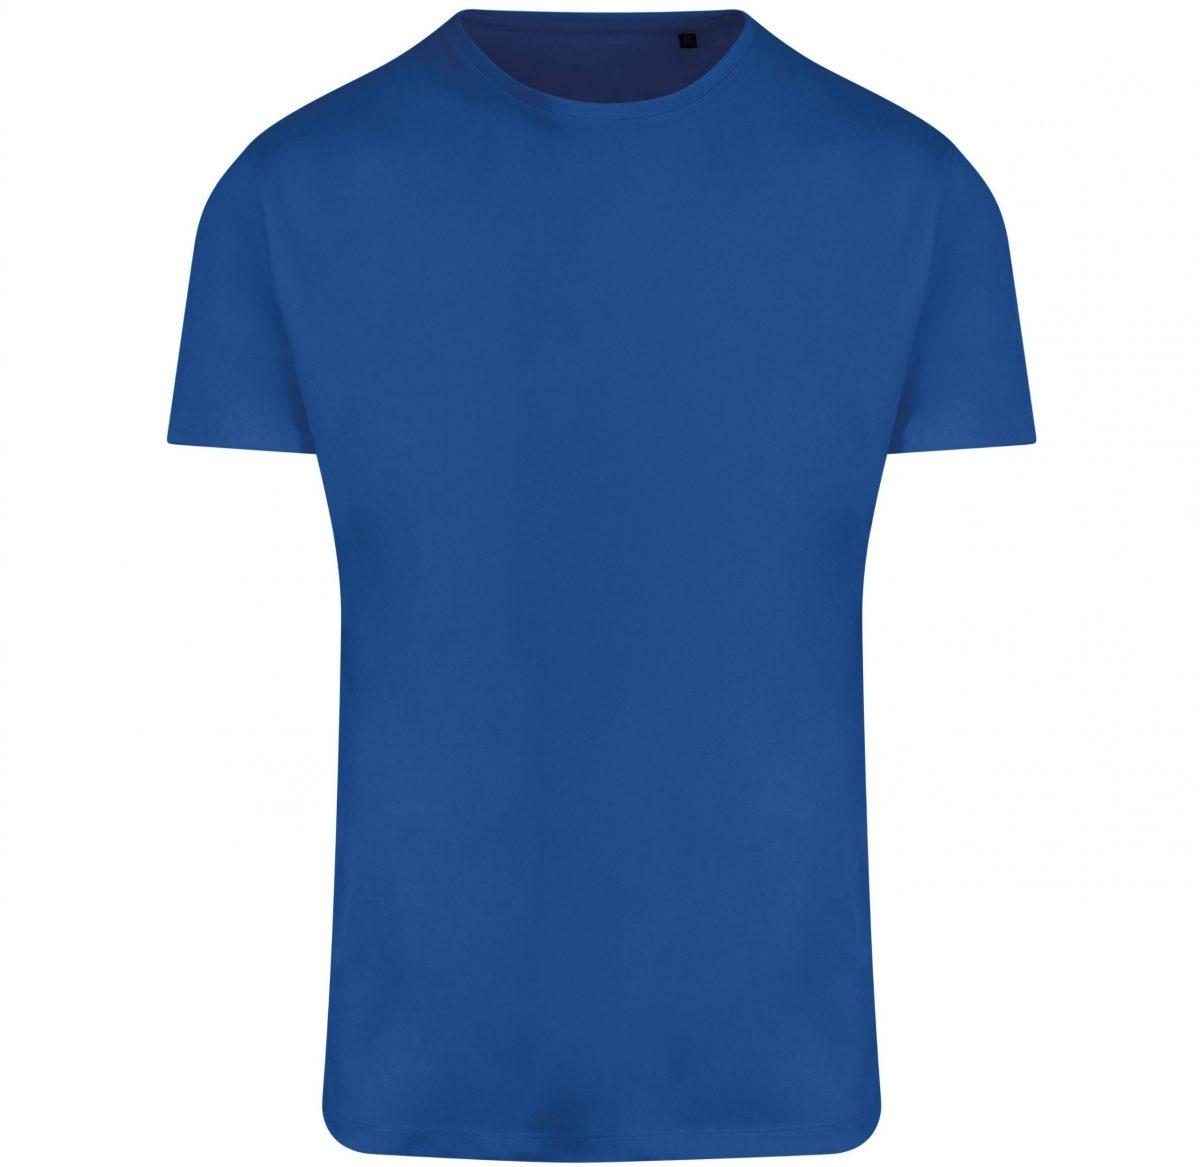 Tee-Shirt Homme Performance – Bleu royal